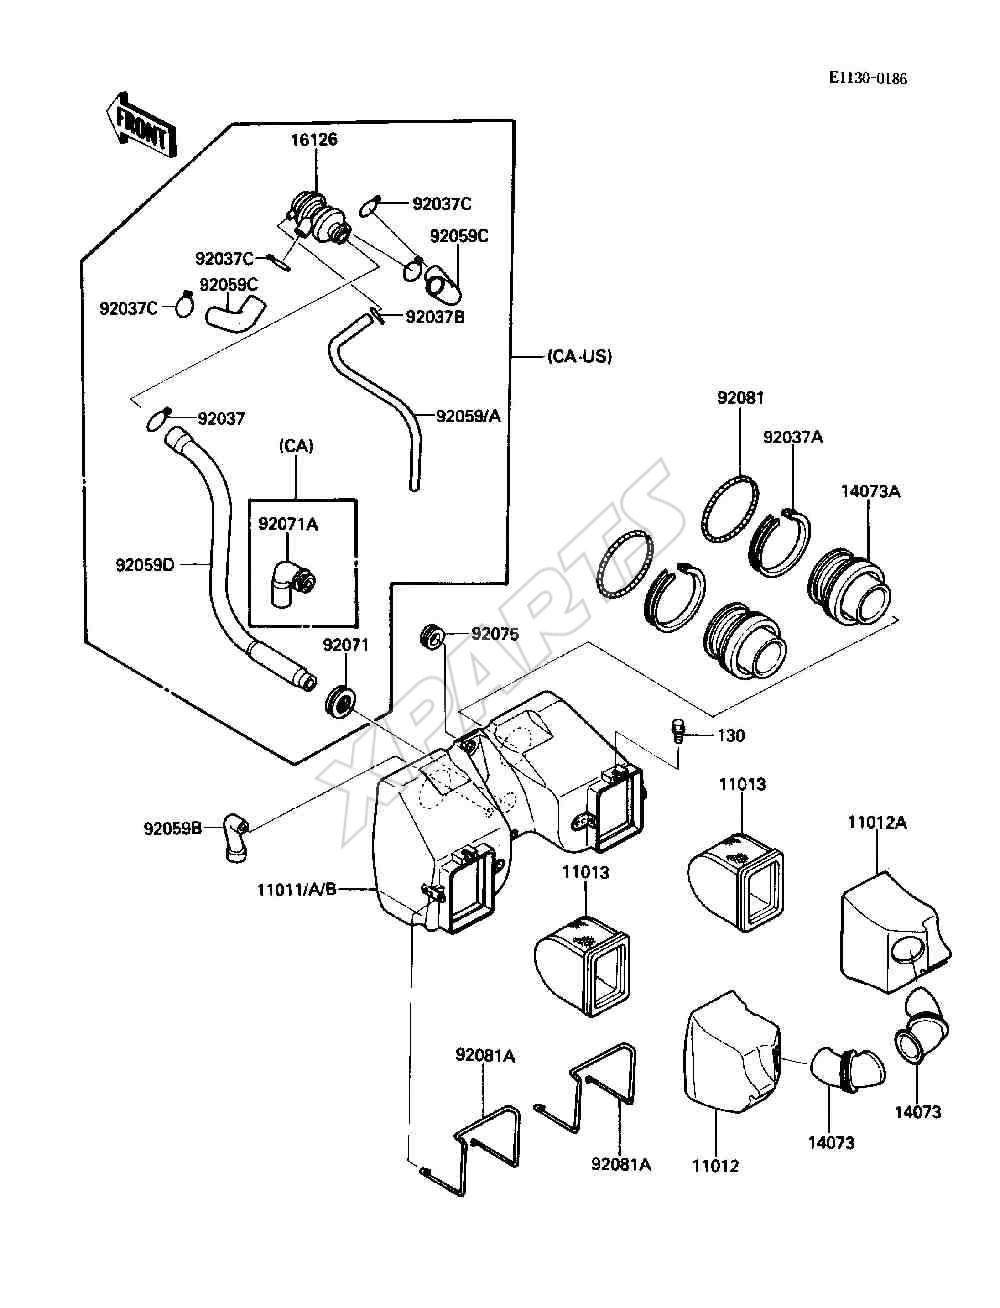 1987 Ford Ltd Fuse Box Diagram Auto Electrical Wiring Renault Megane In Engine Bay 1986 Kdx80 U2022 Mifinder Co